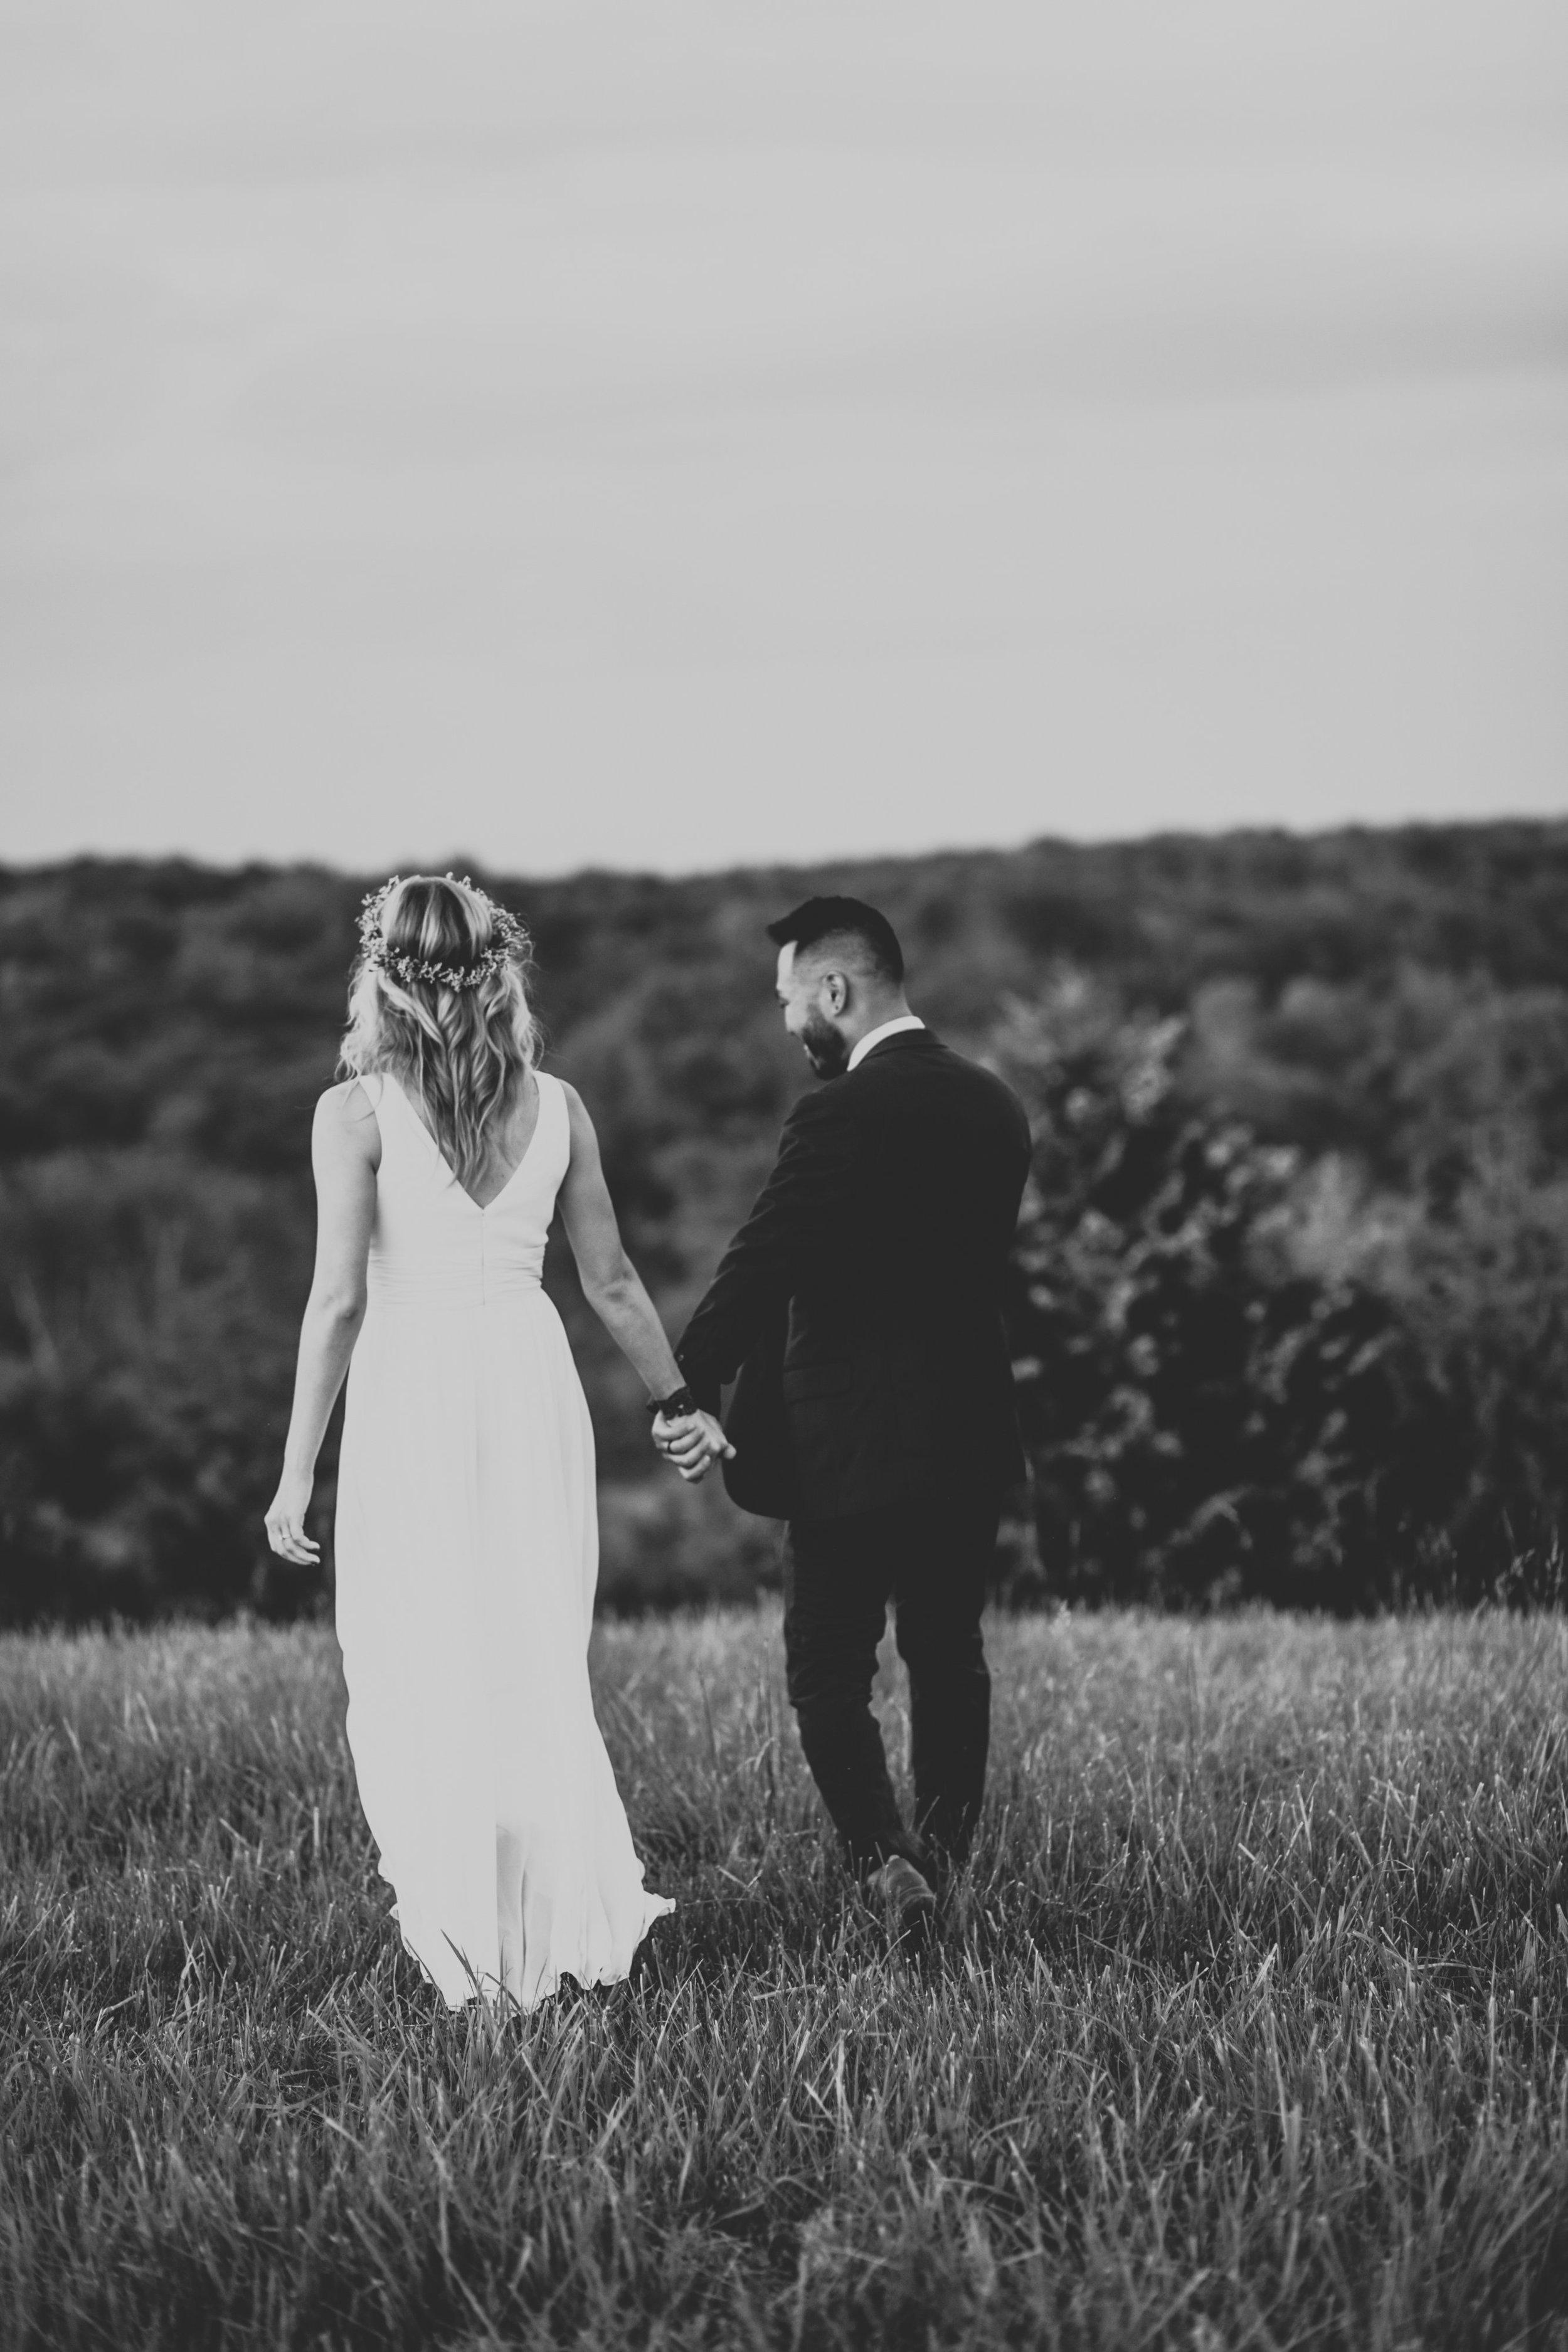 Emily and Zach-Wedding Finals 2-0115.jpg